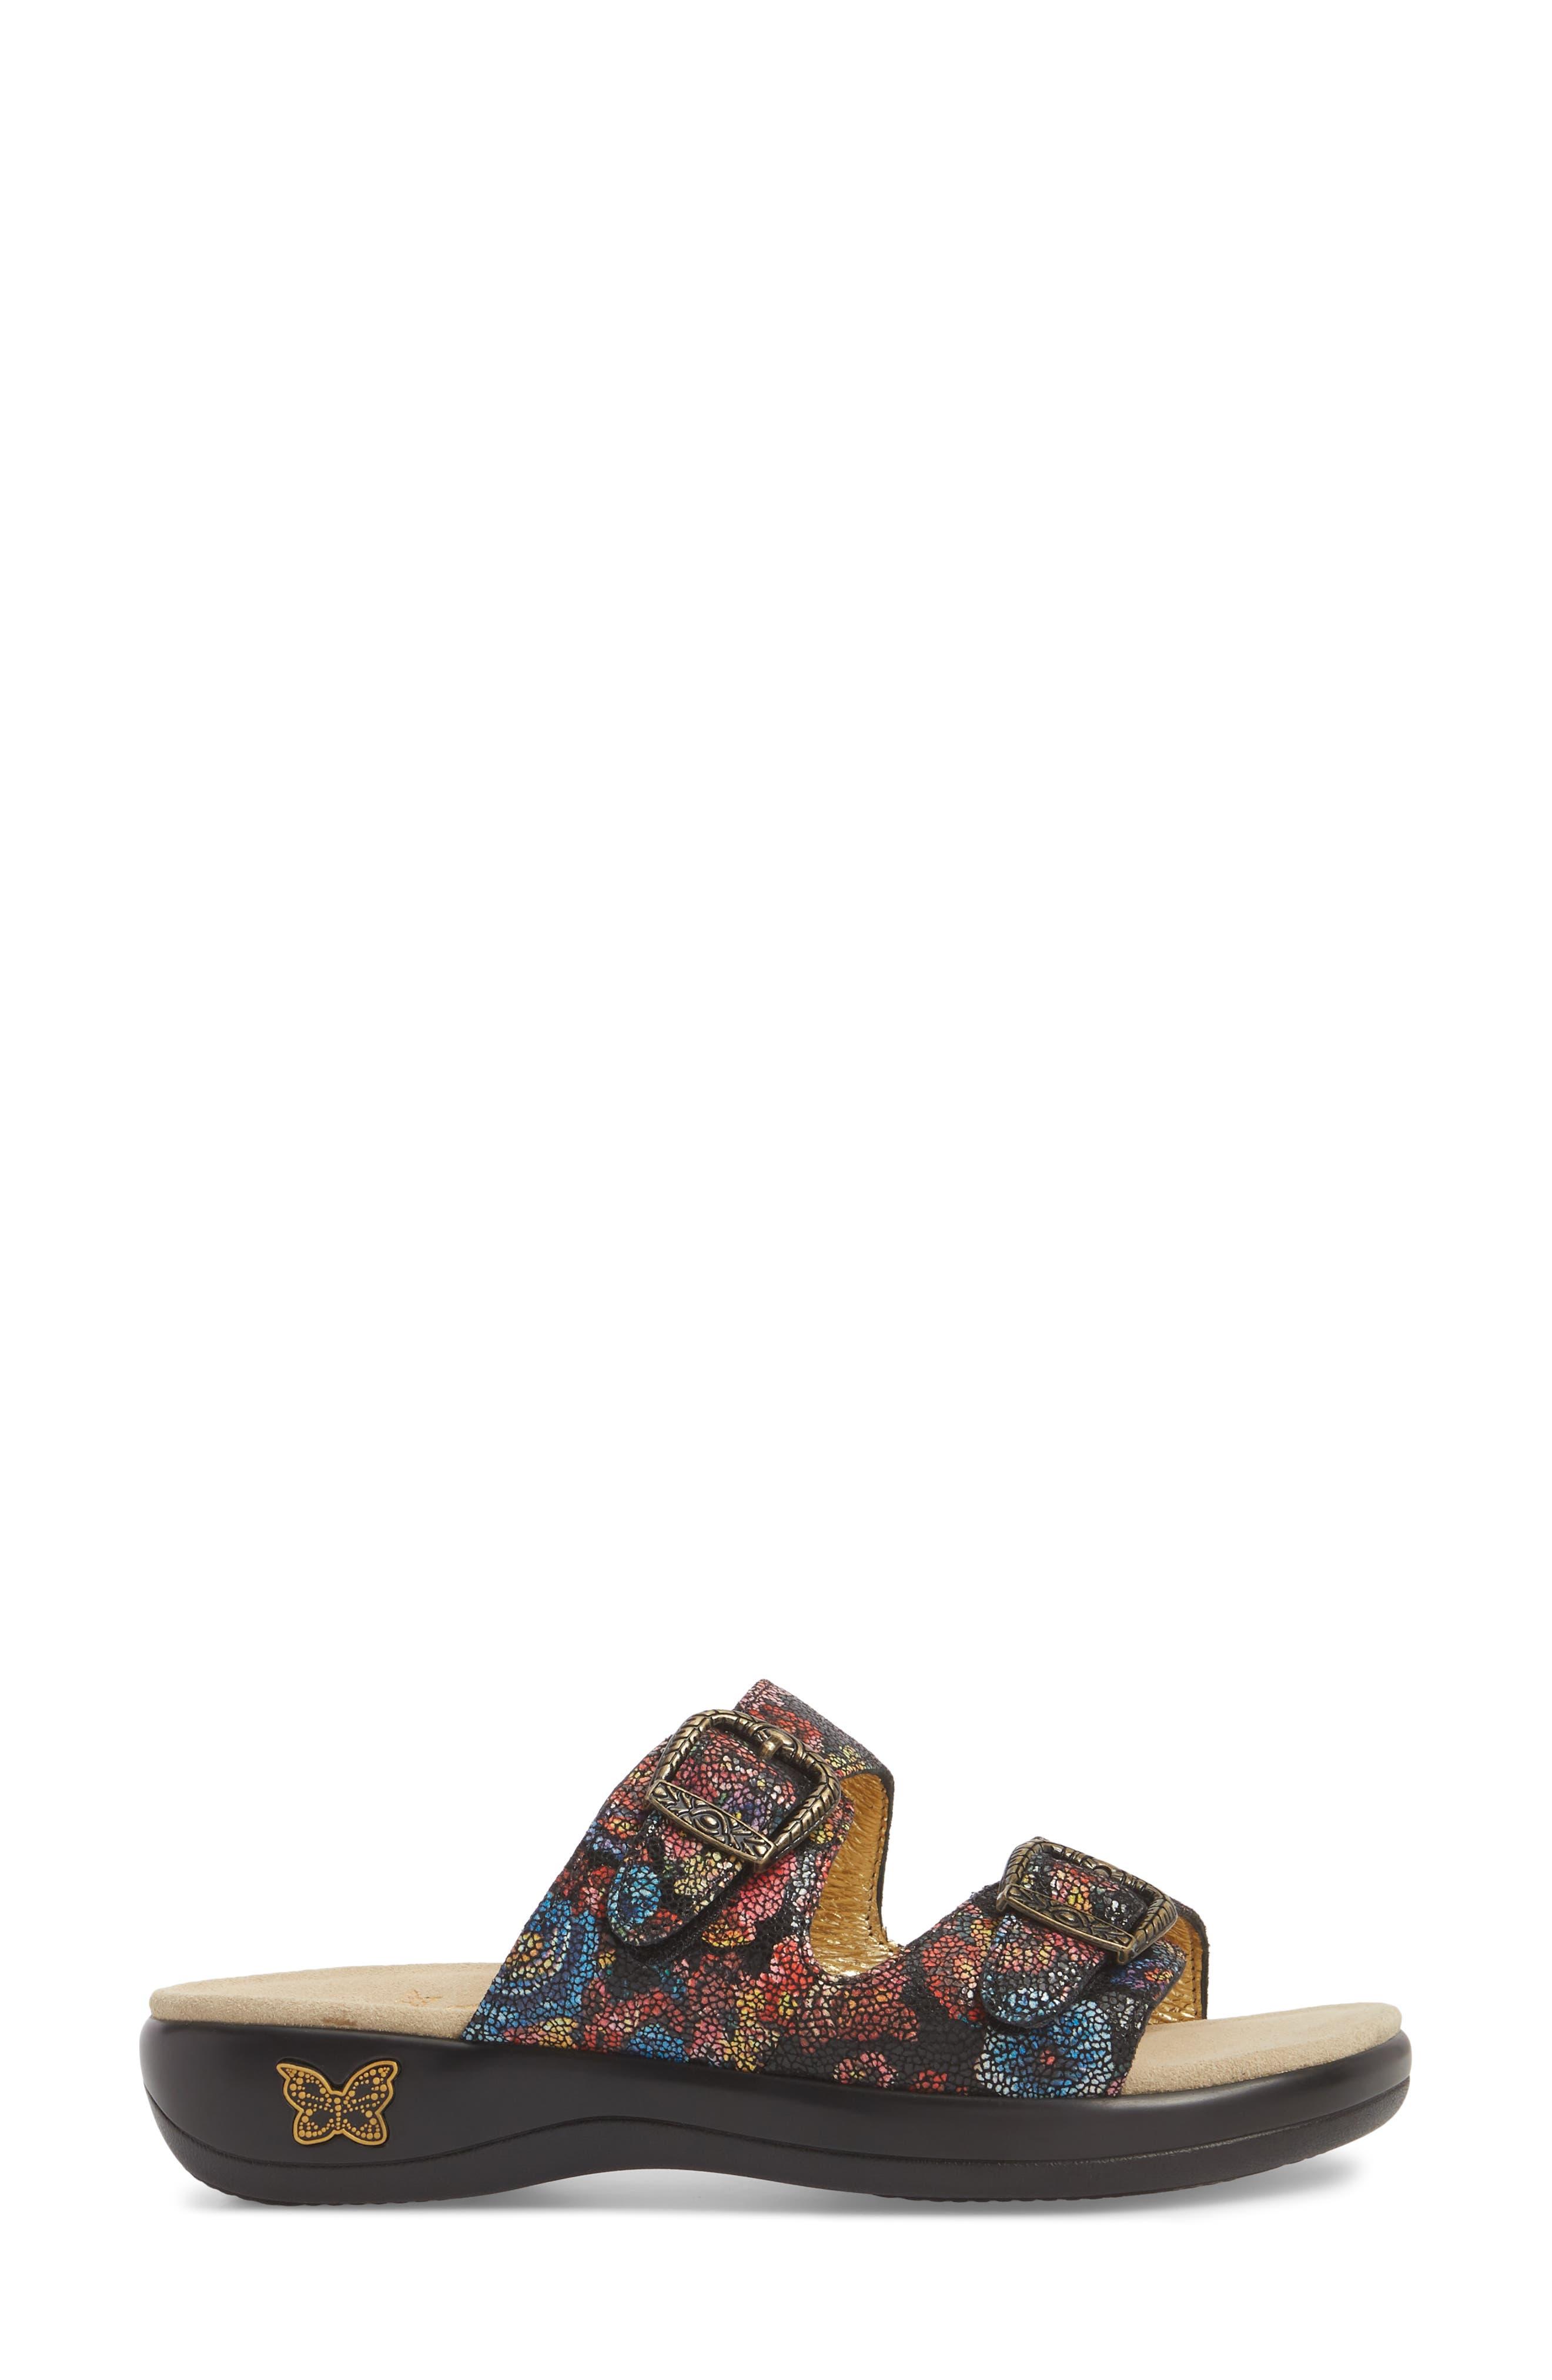 Jade Sandal,                             Alternate thumbnail 3, color,                             Florensic Files Leather